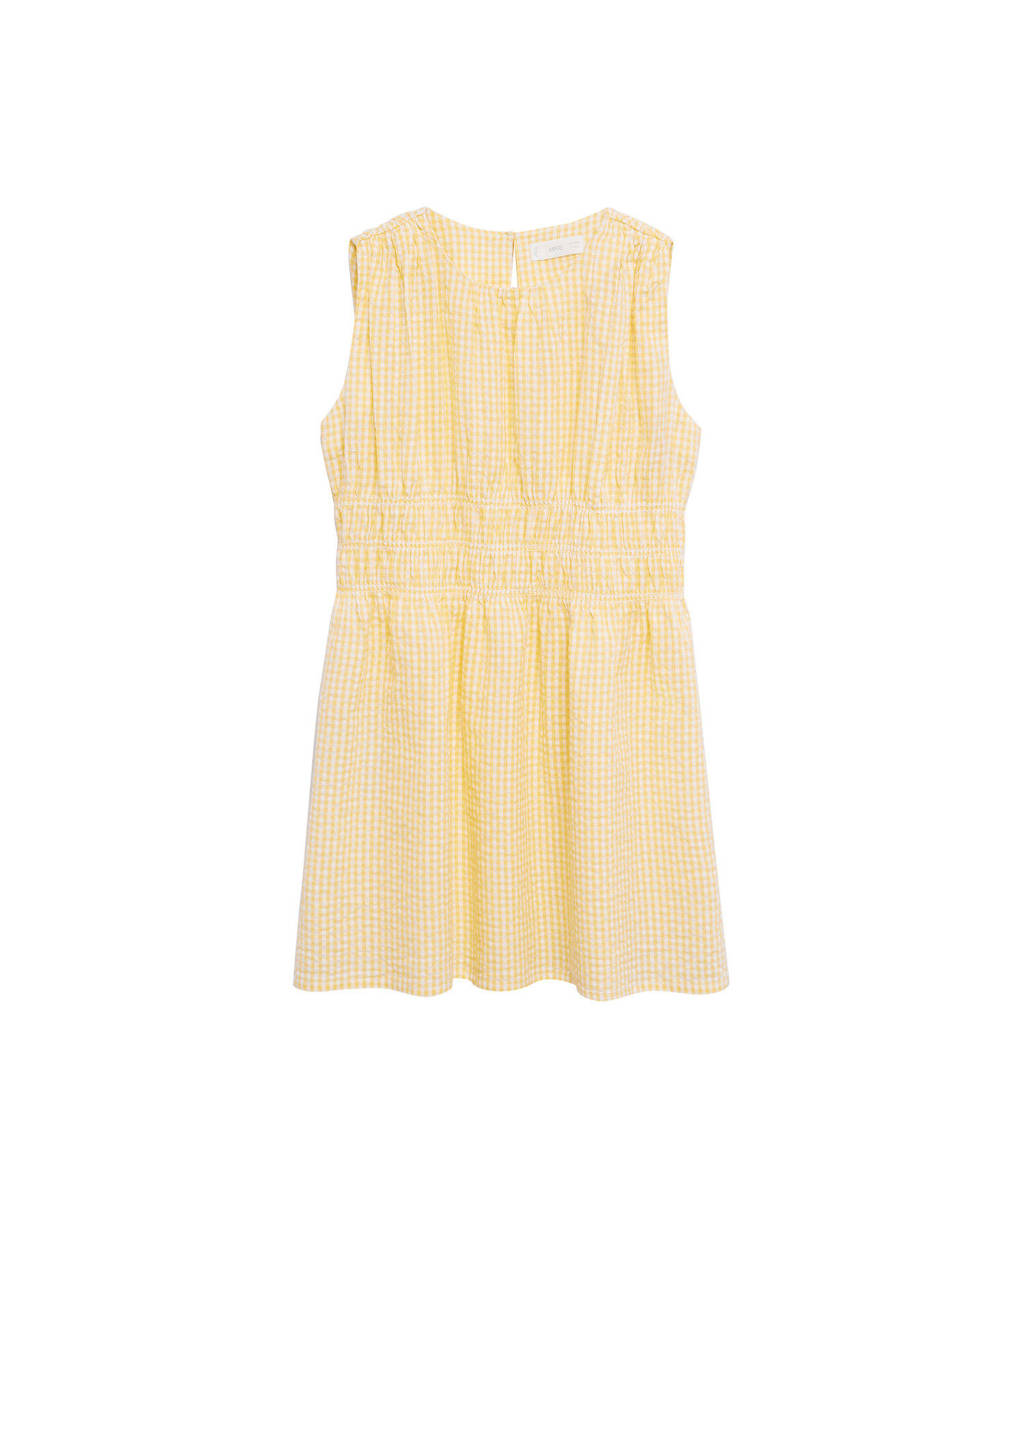 Mango Kids geruite jurk geel/wit, Geel/wit